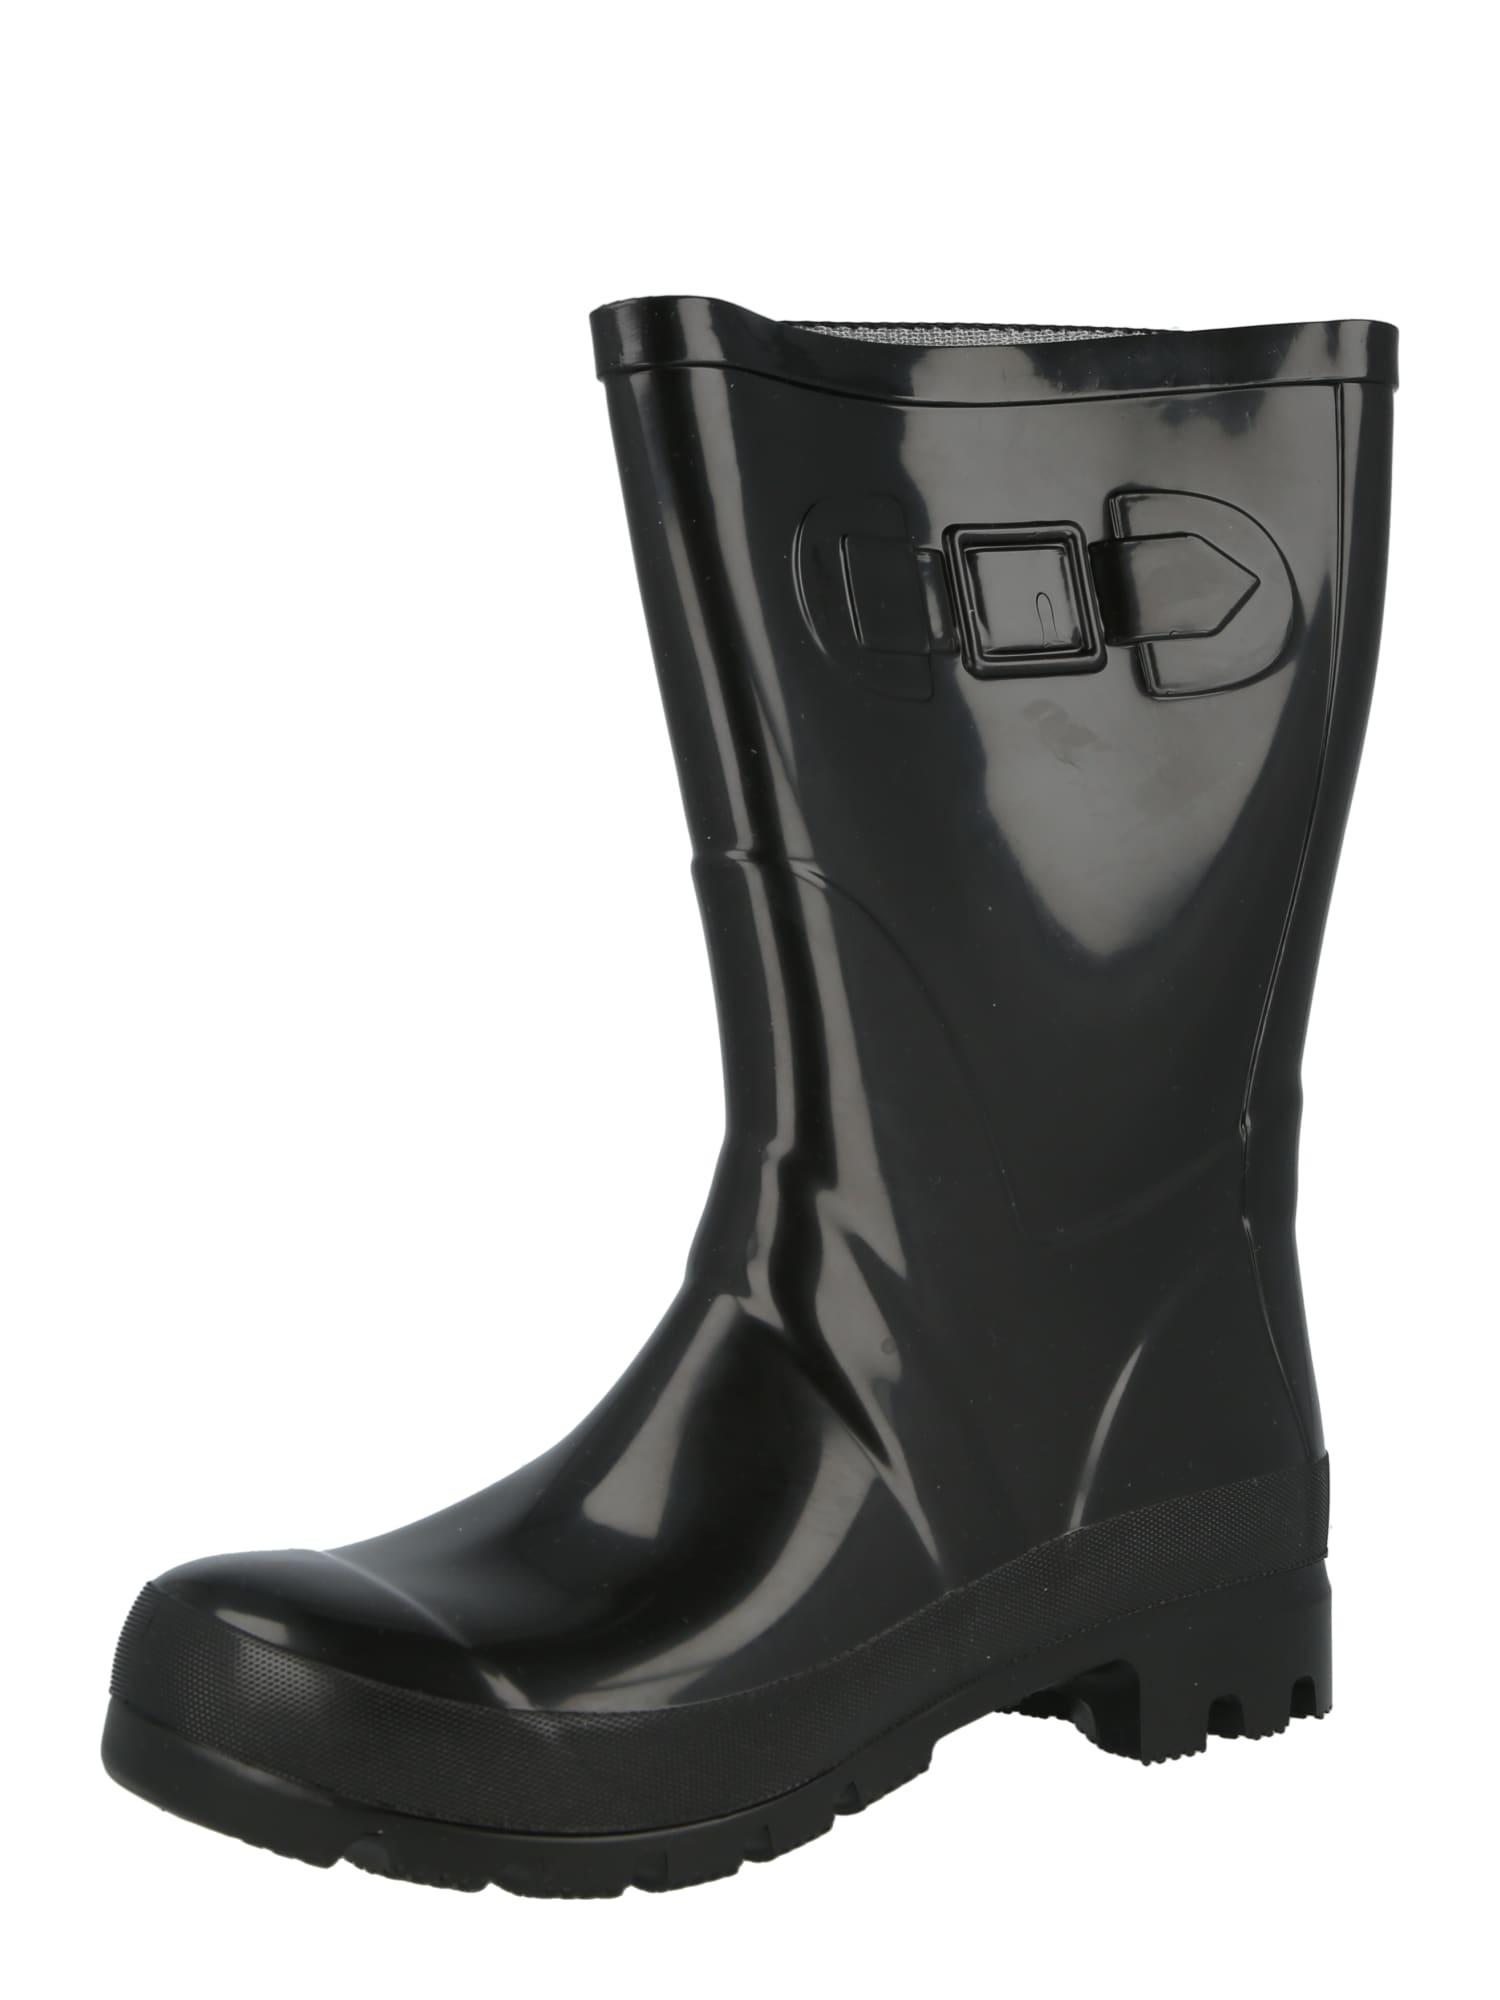 BECK Guminiai batai juoda